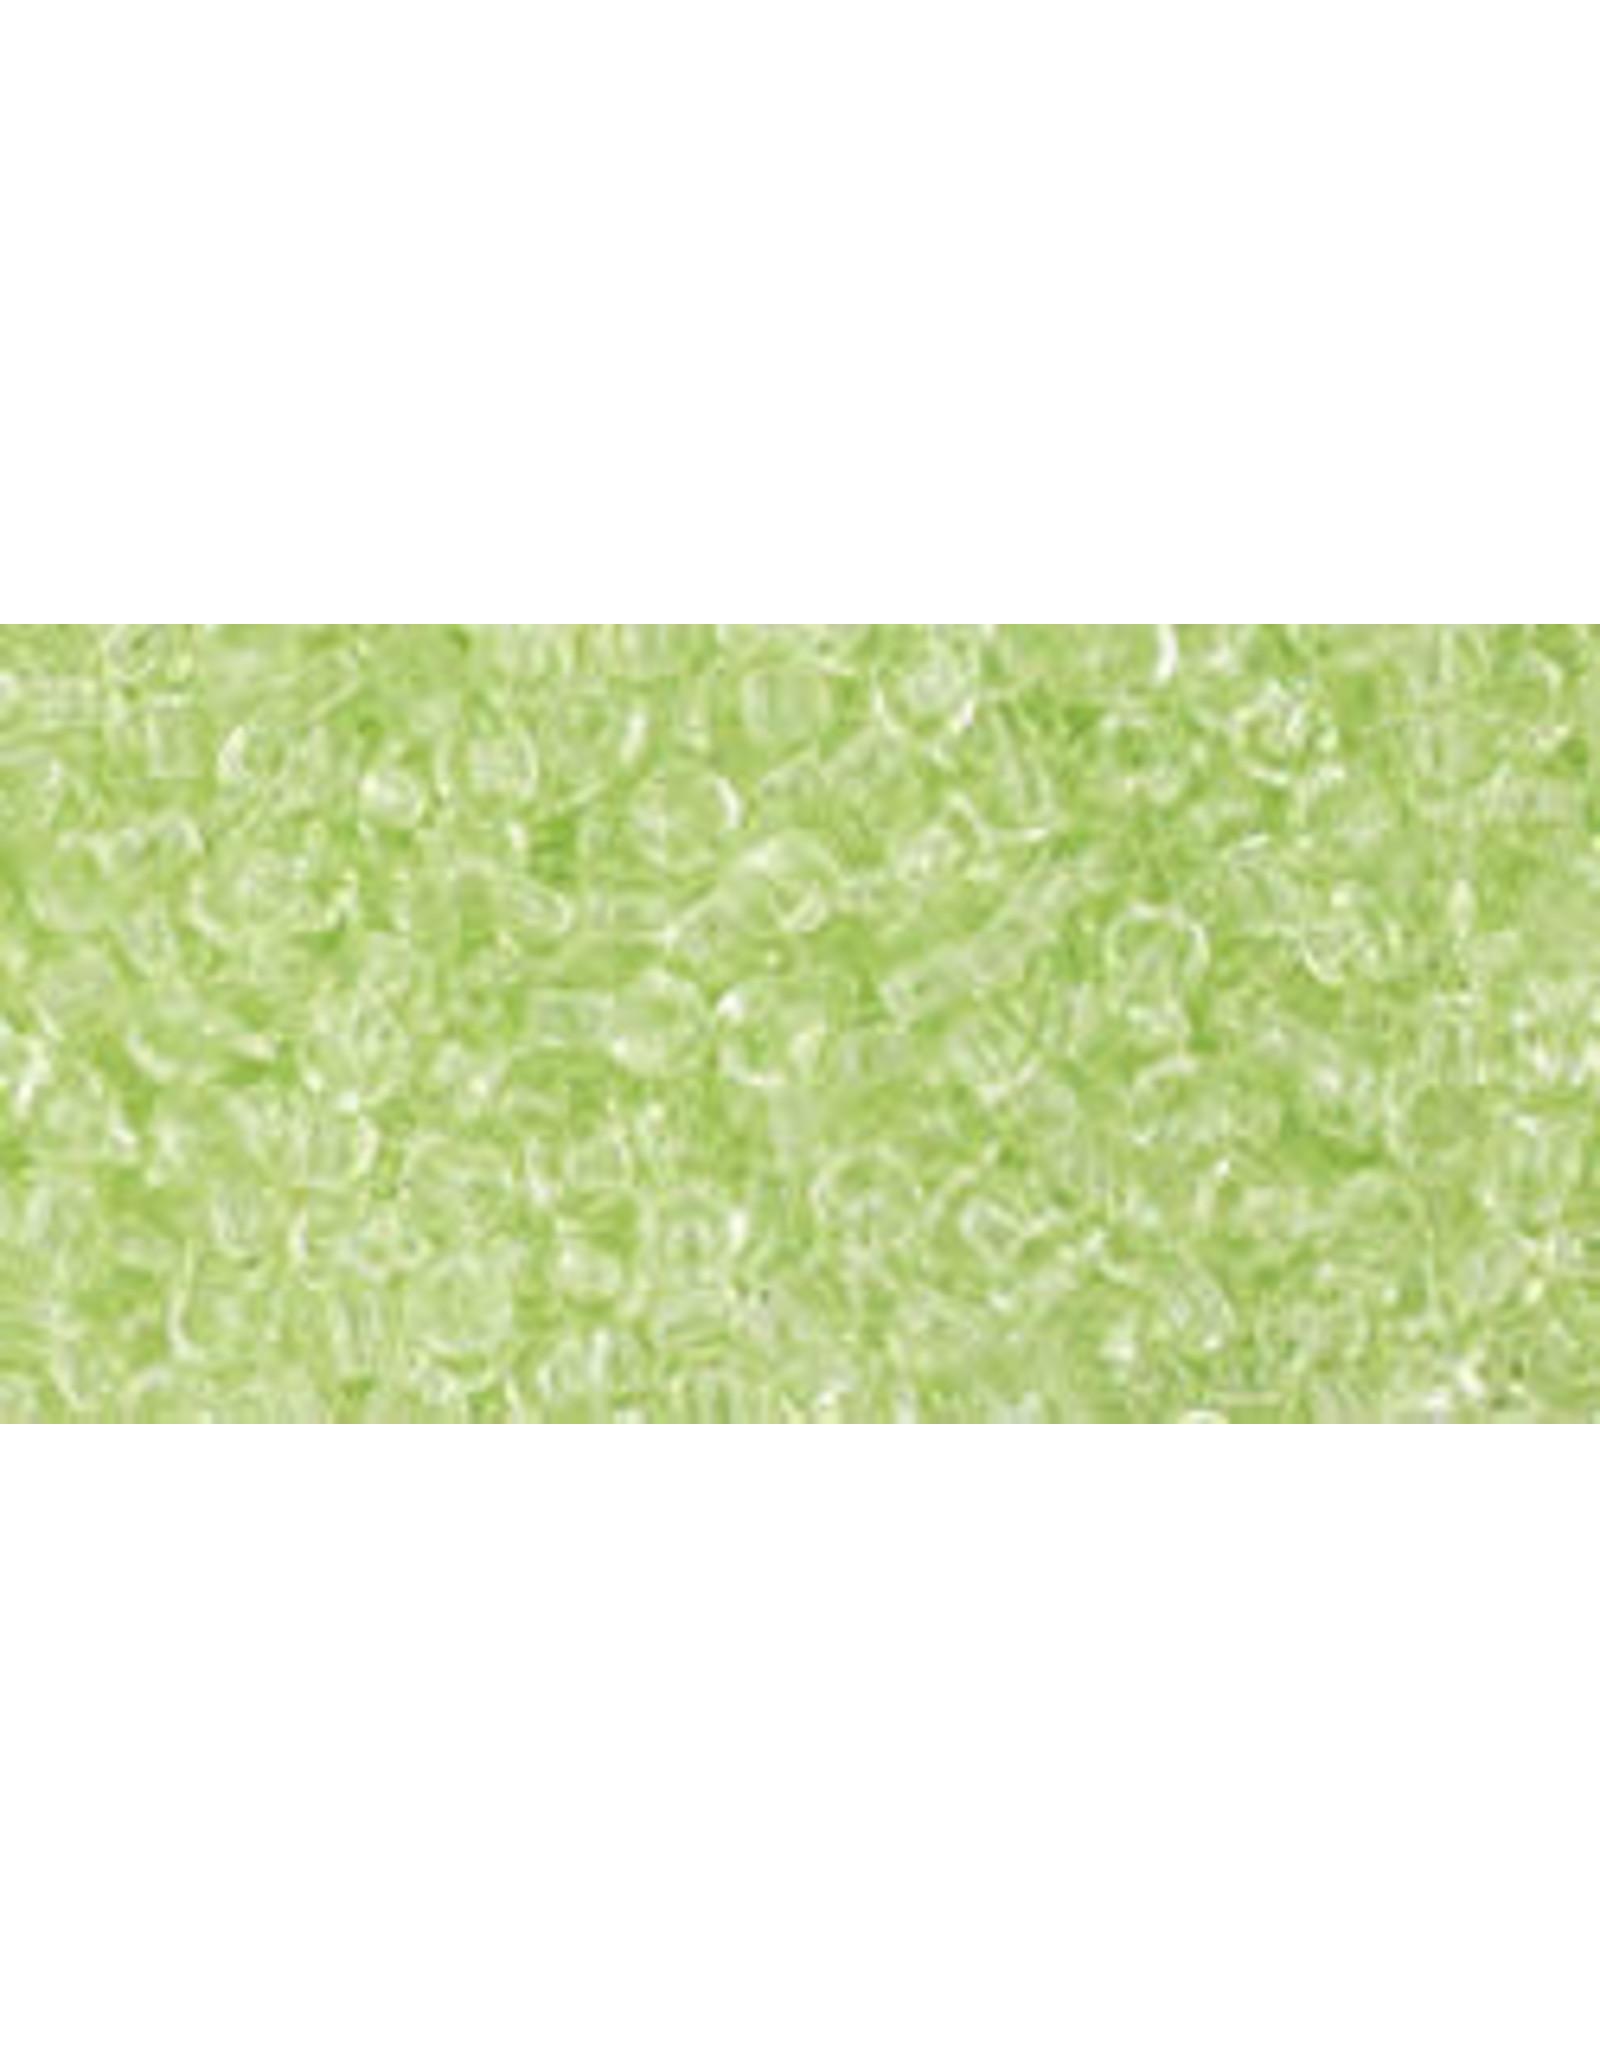 Toho 15 11  Round 6g Citrus Spritz Green